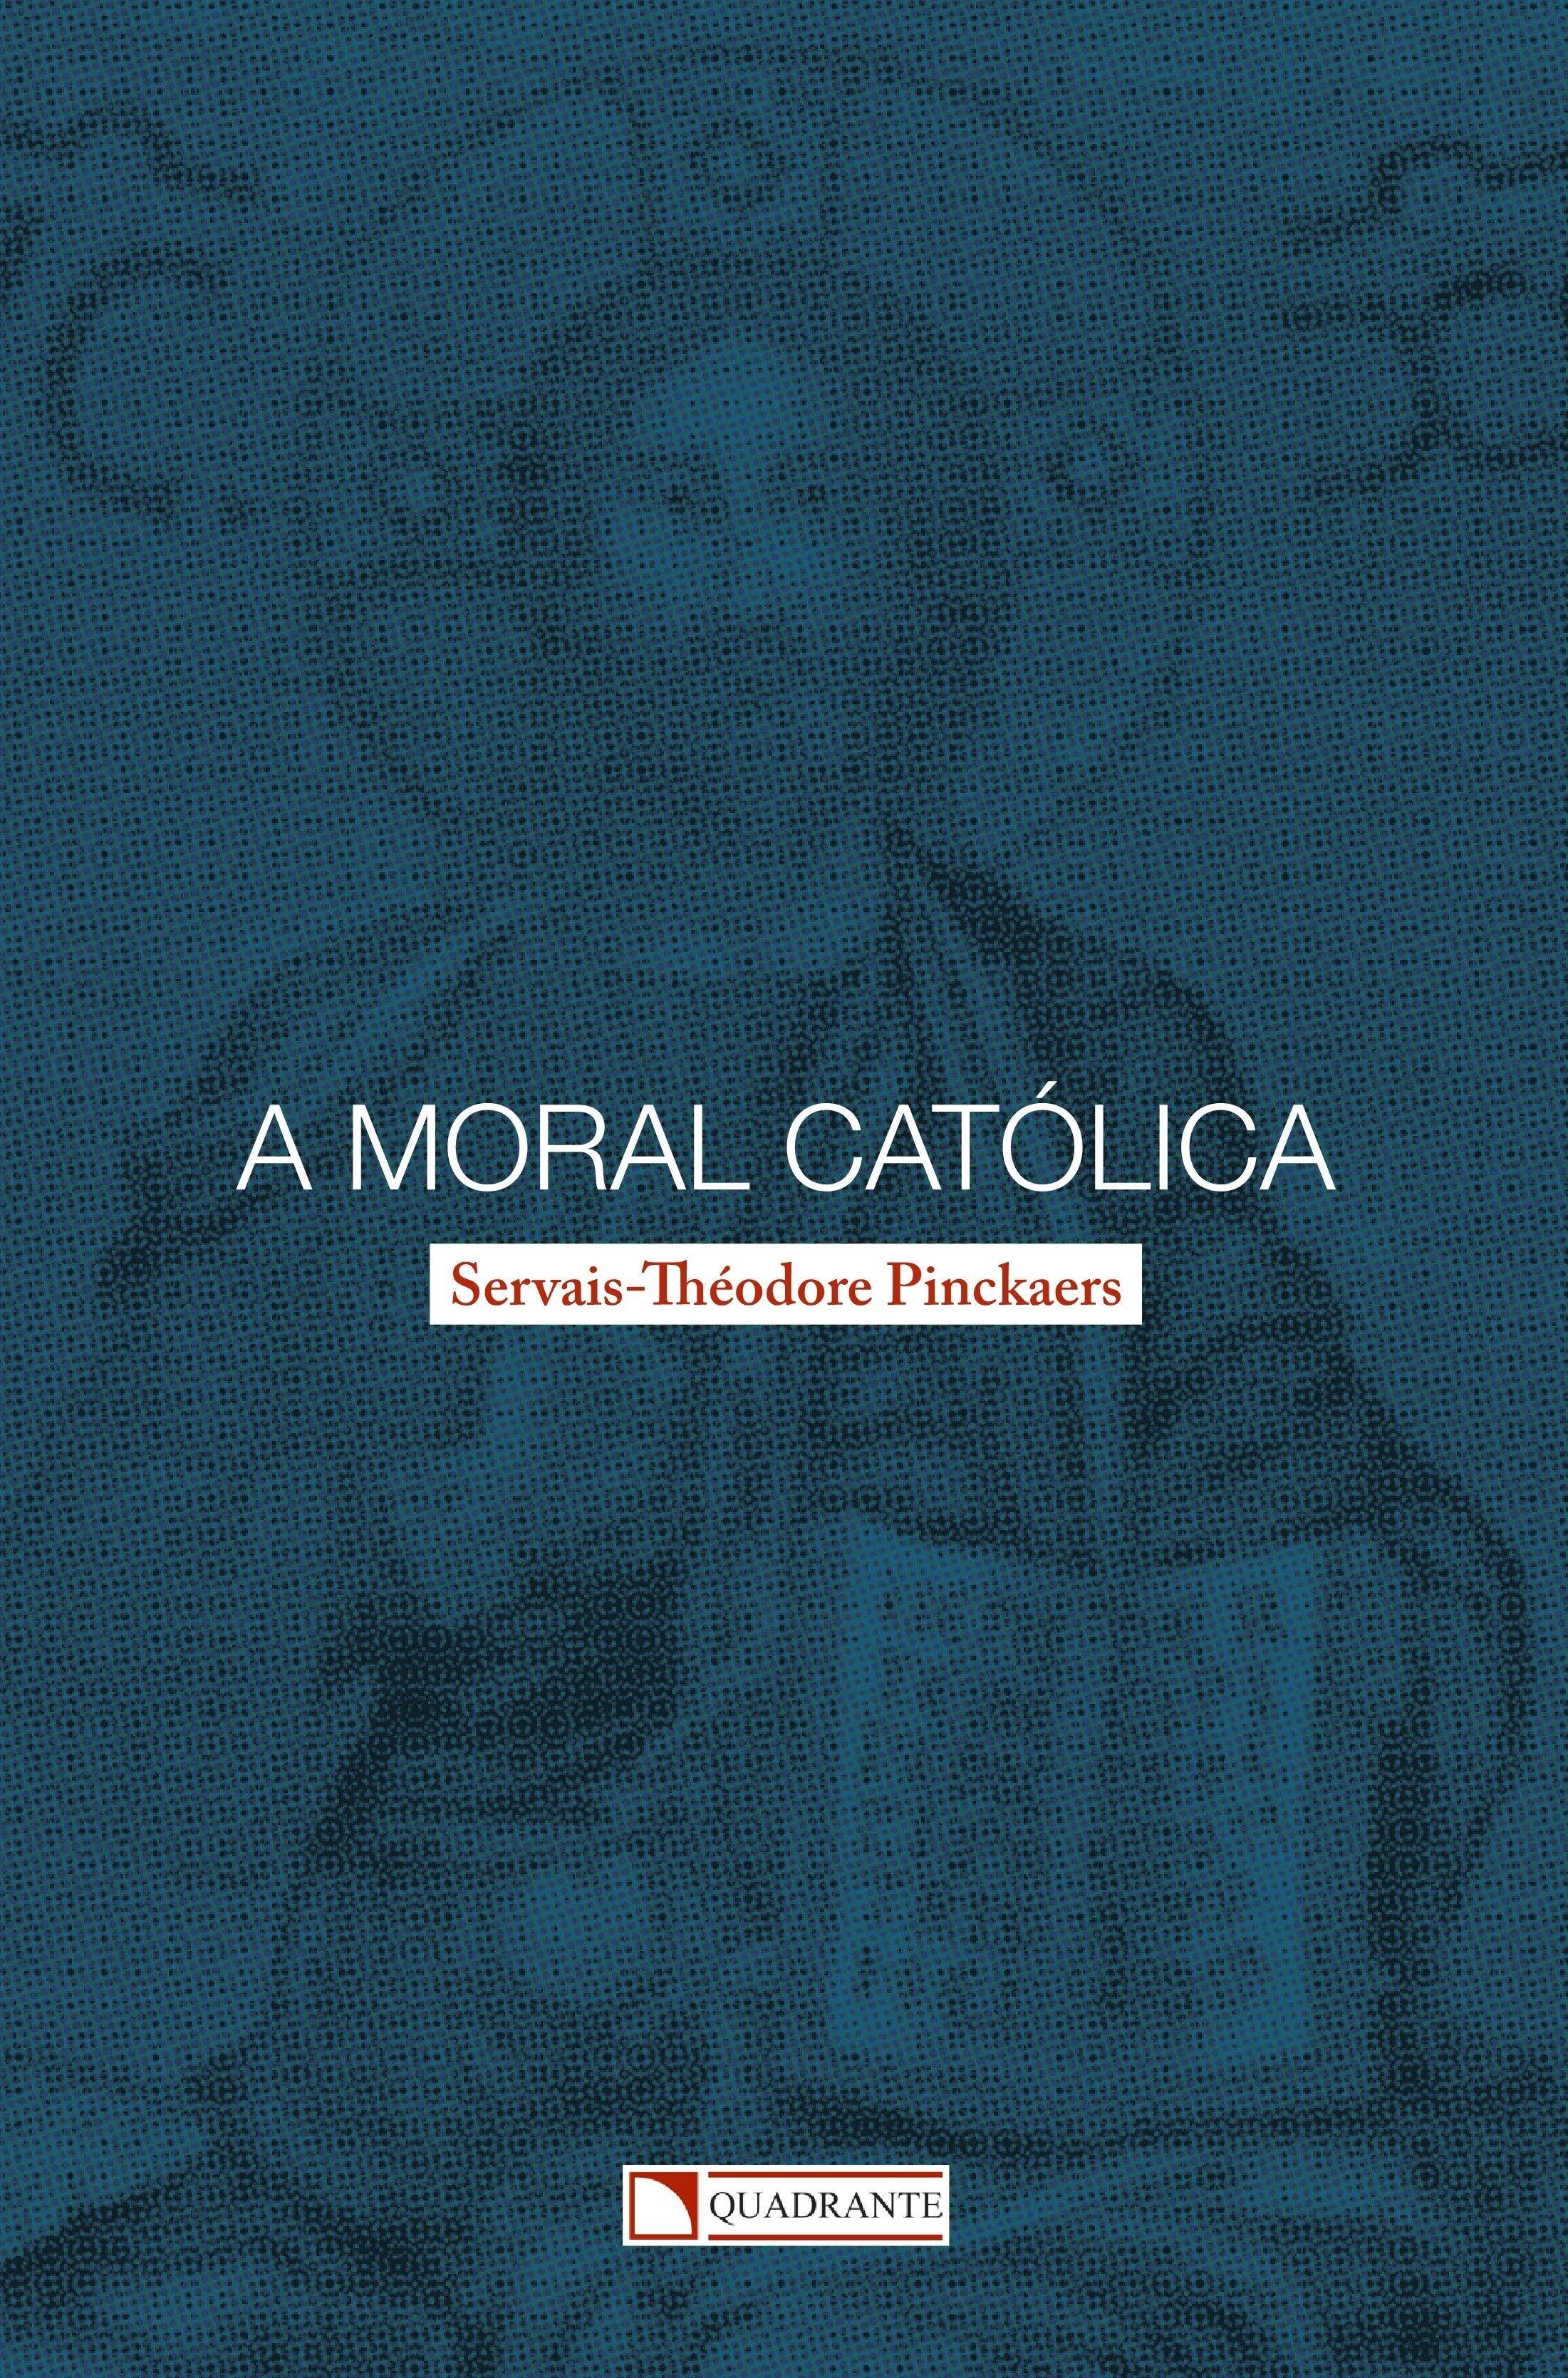 A moral católica